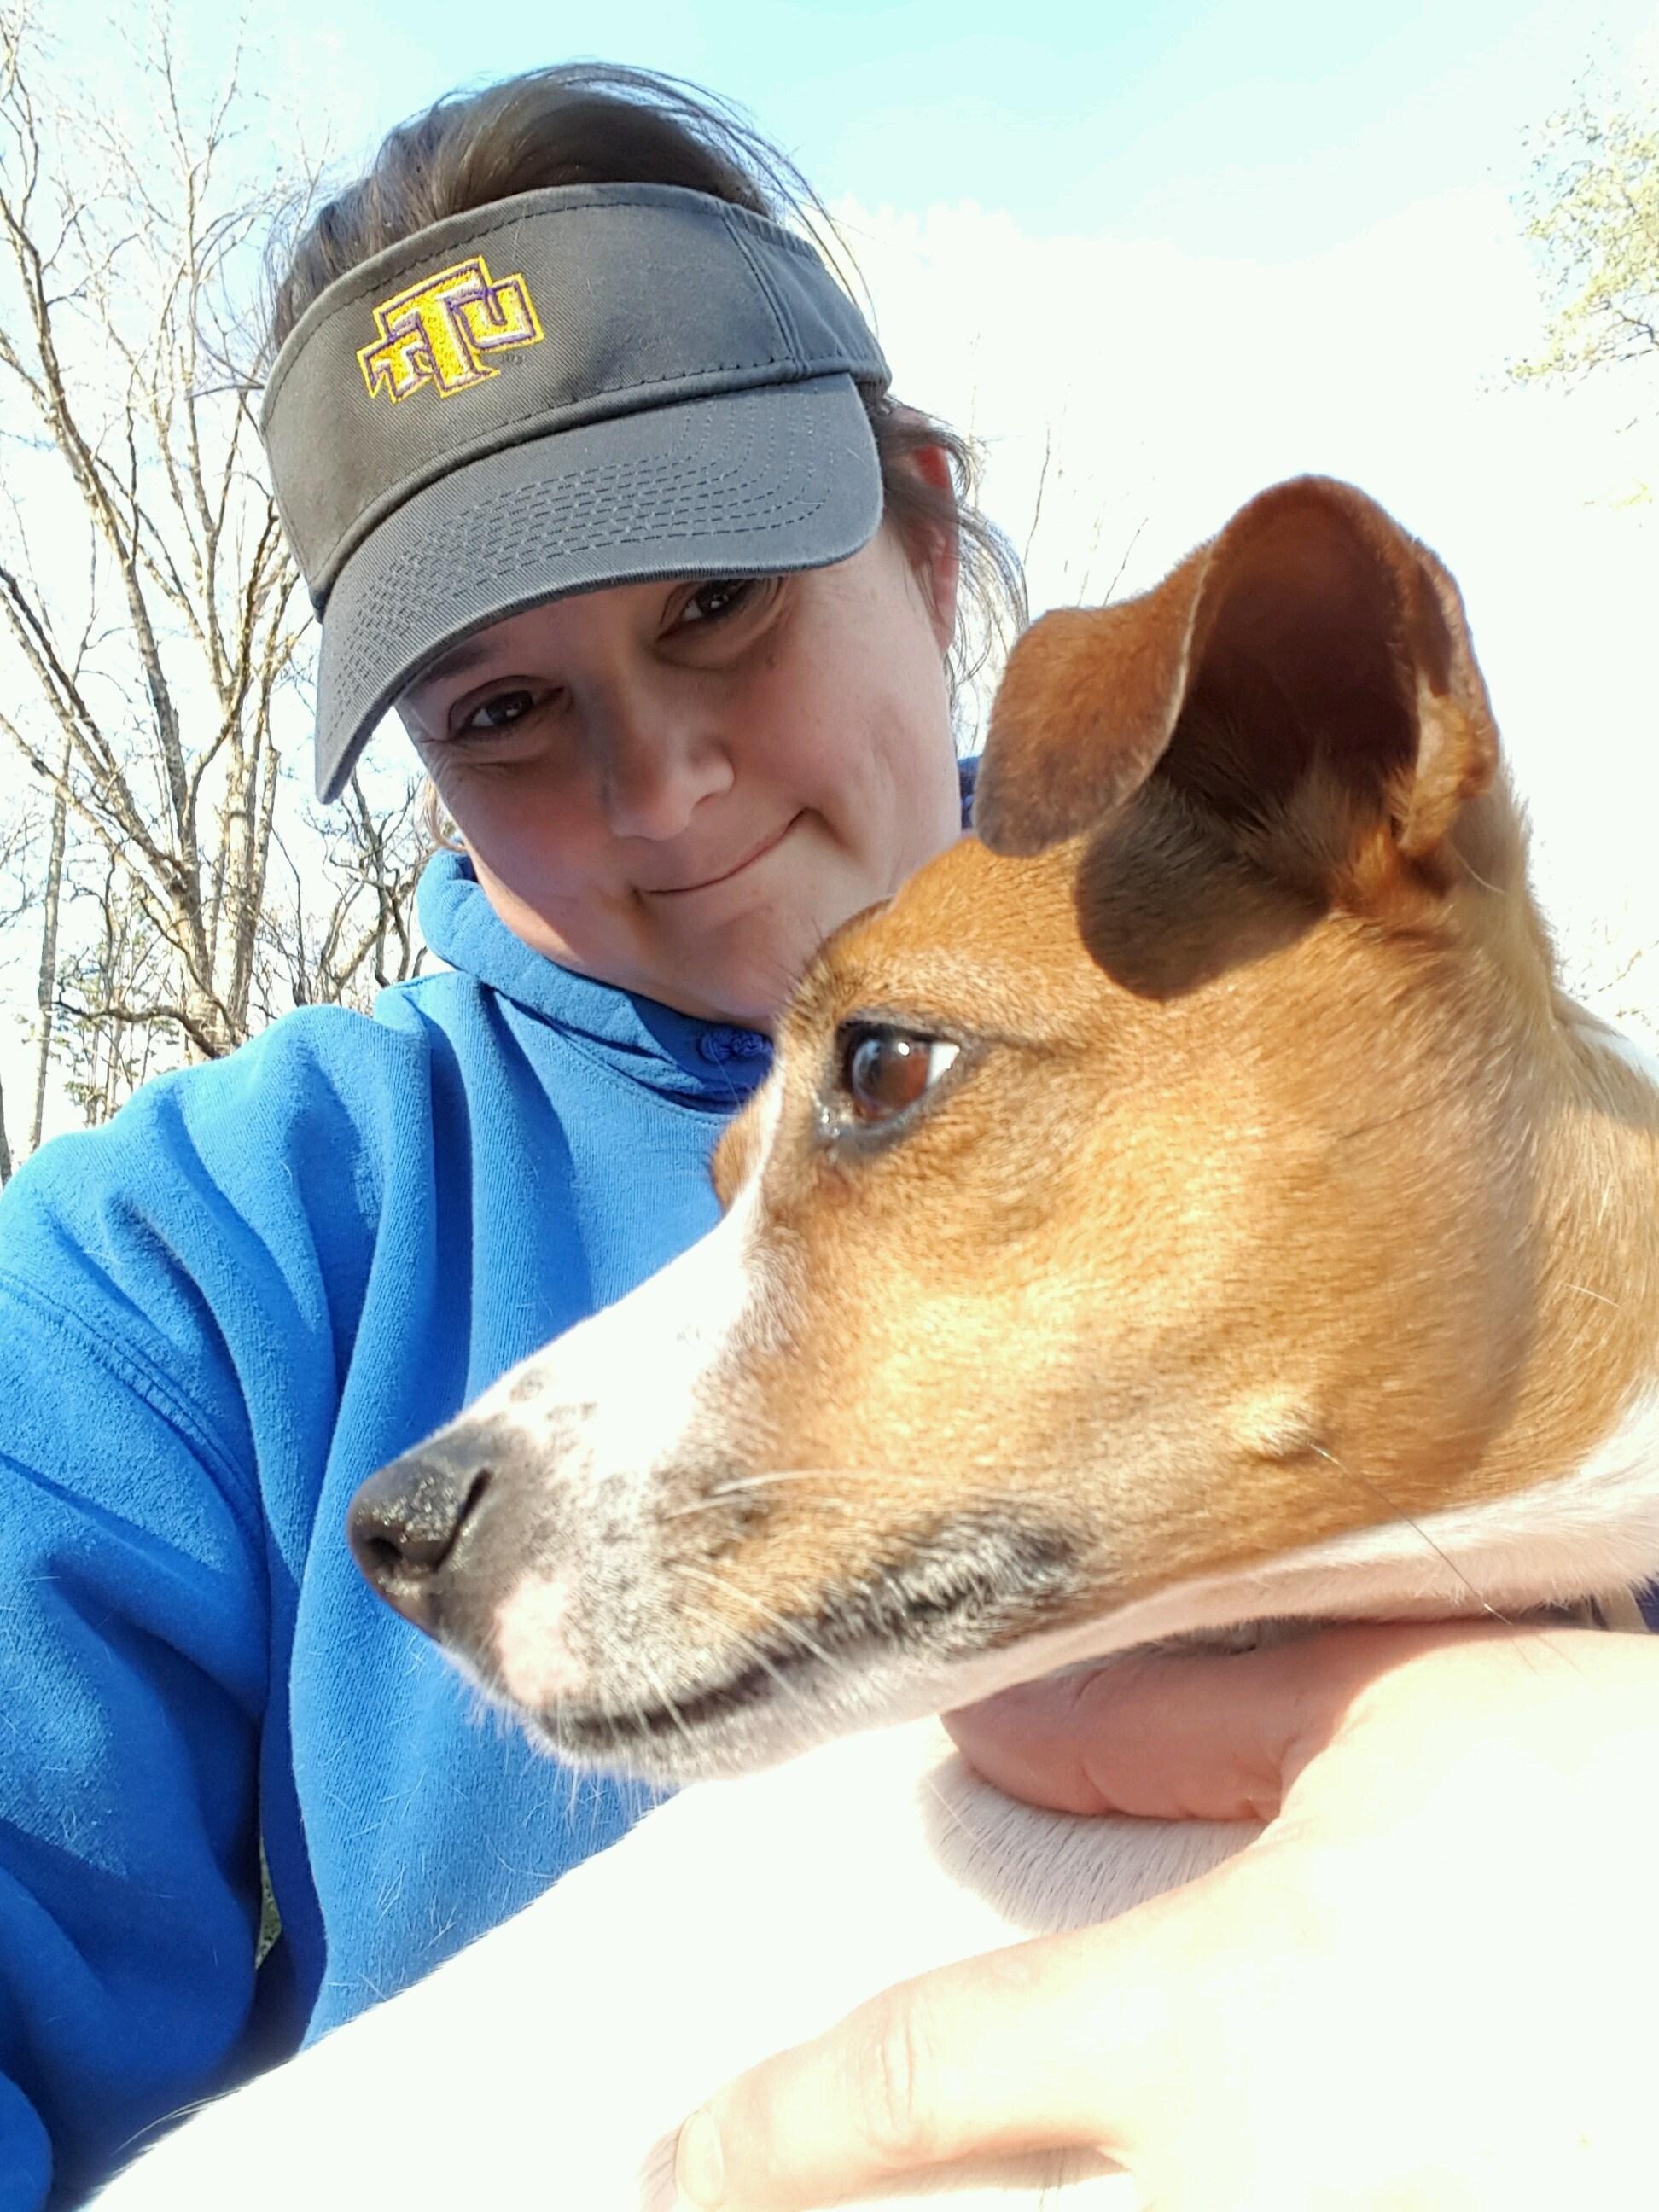 Jammie Lowery with her dog Josie